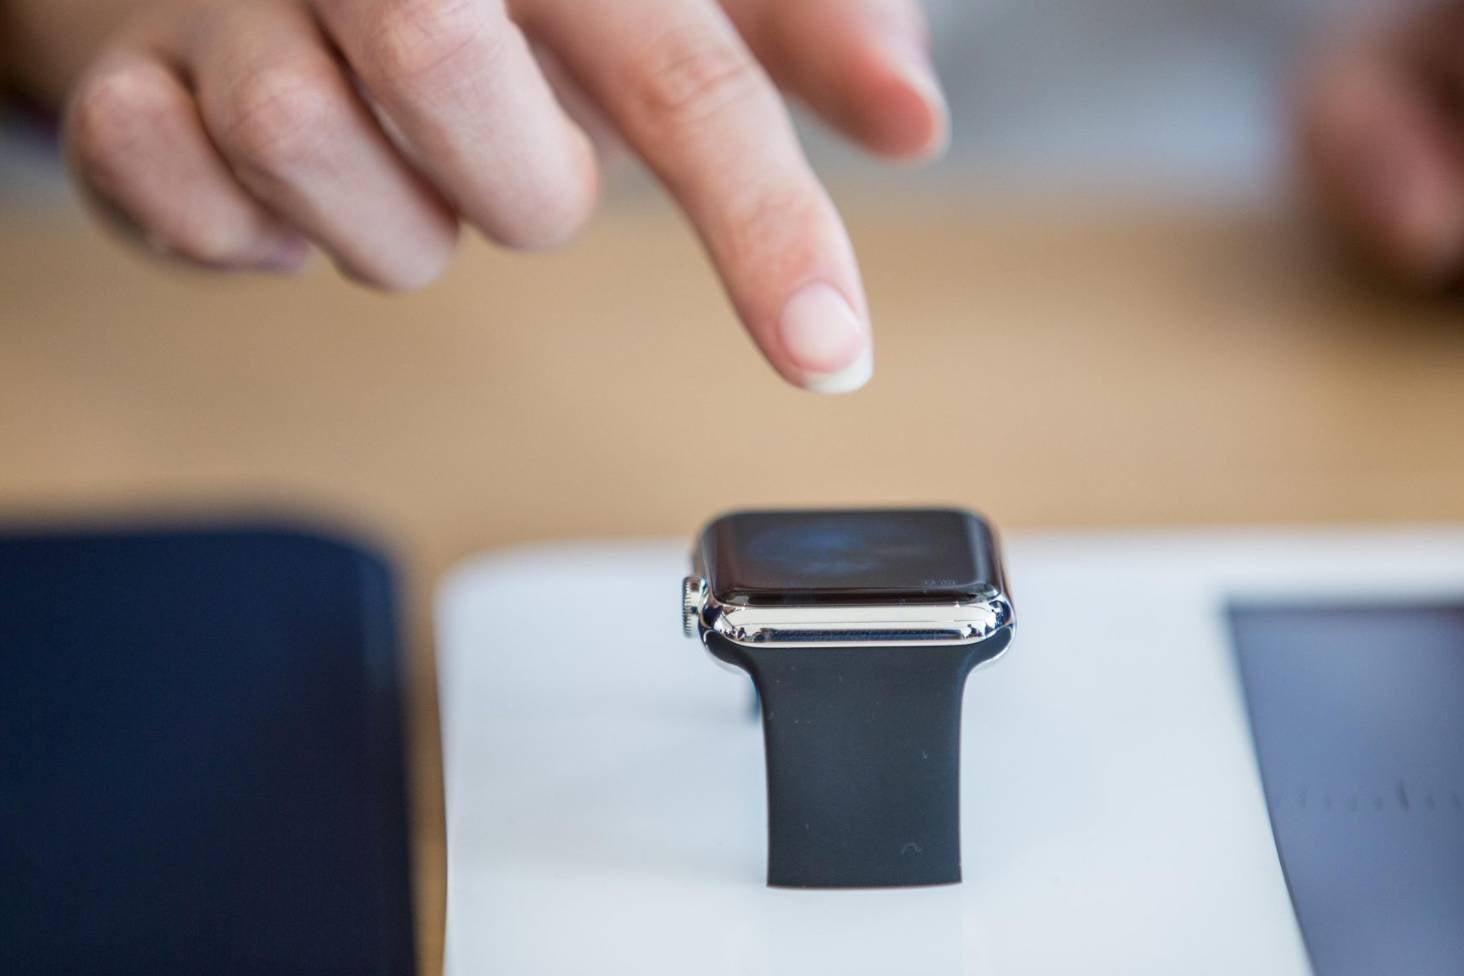 Is the new Samsung Galaxy Watch worth buying? | Stuff co nz